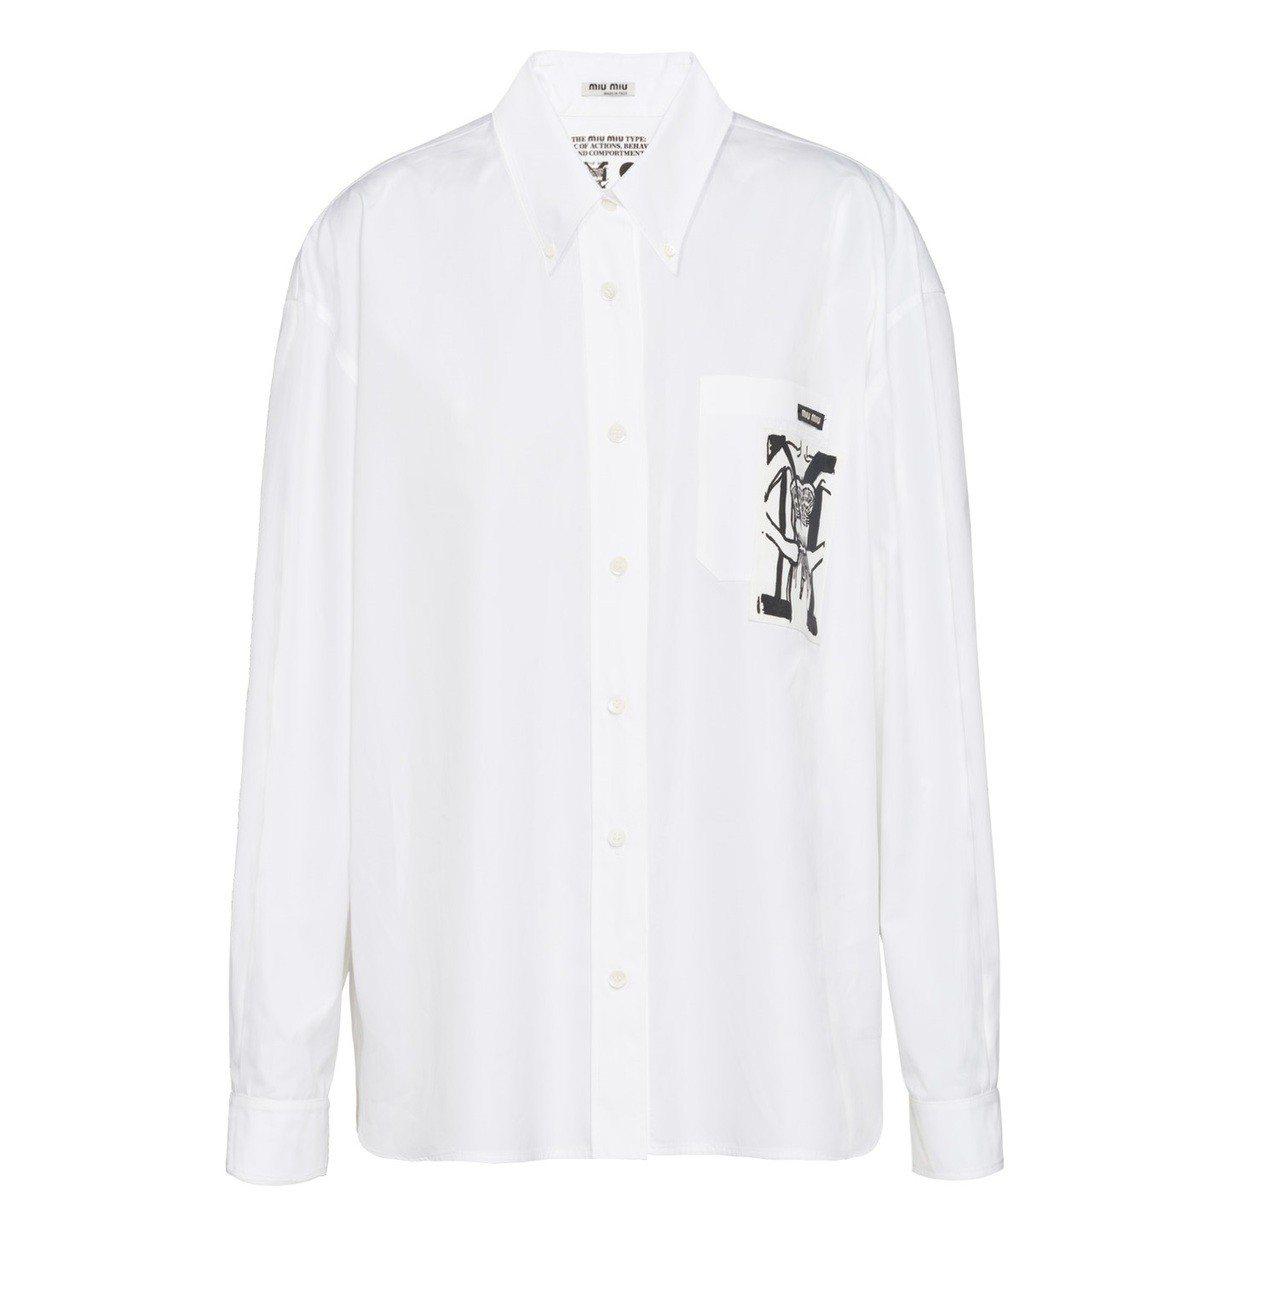 Miu Miu Type訂製襯衫,32,000元。圖/Miu Miu提供